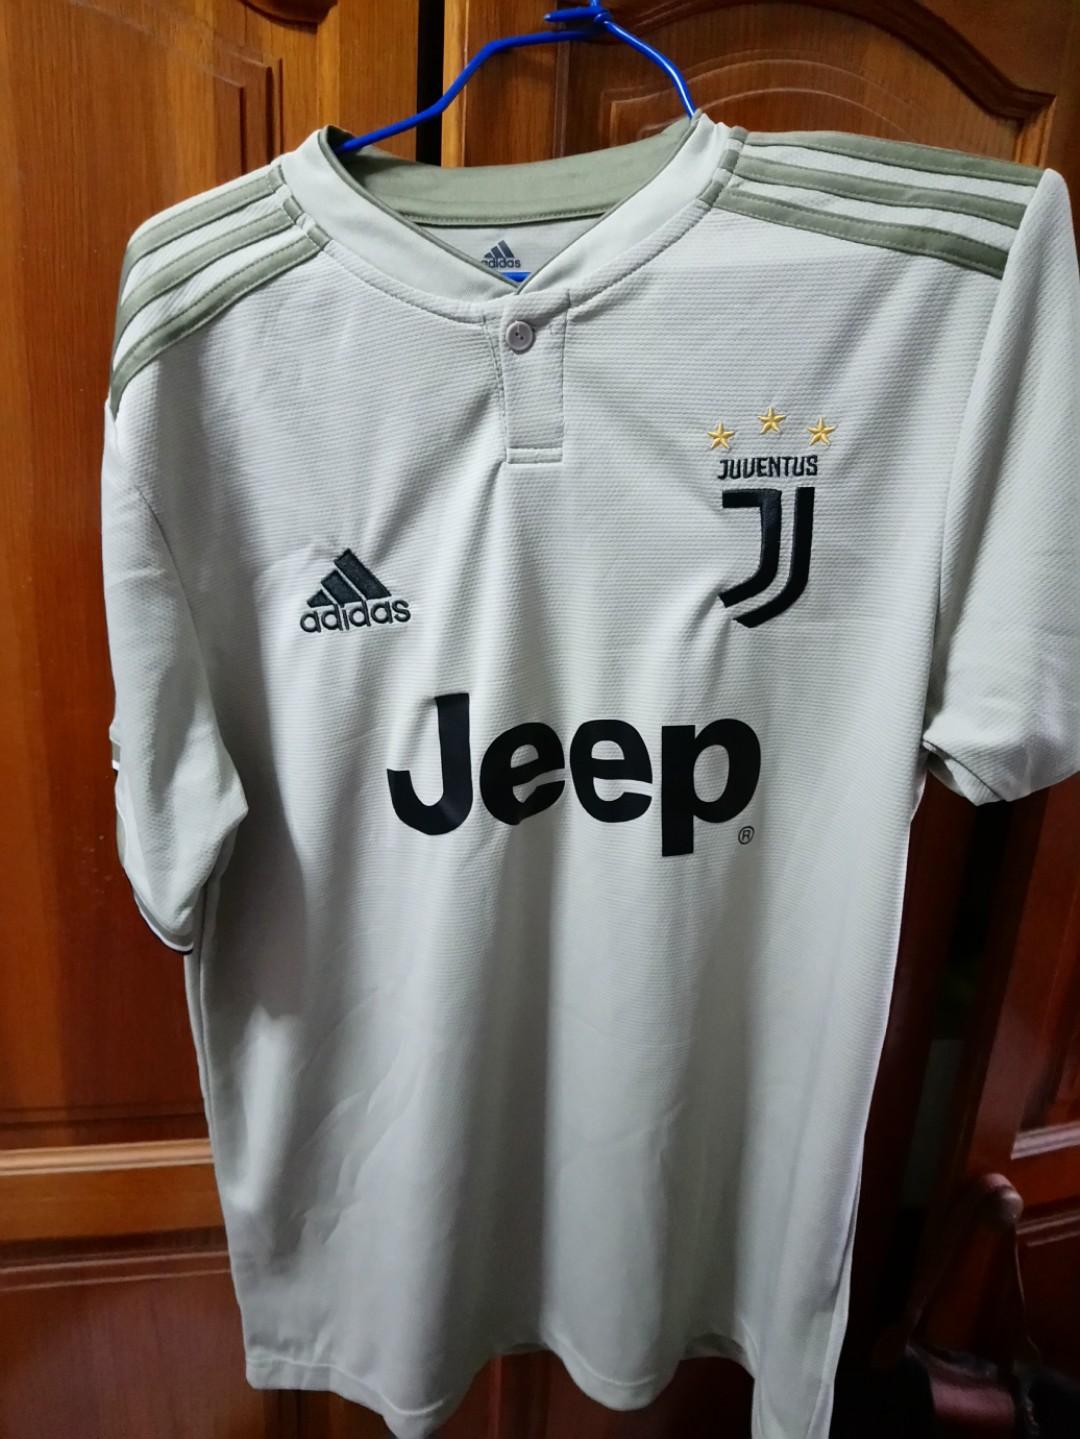 best sneakers 5581d 27558 Juventus Away Kit 2019 - Free Photo and Wallpaper